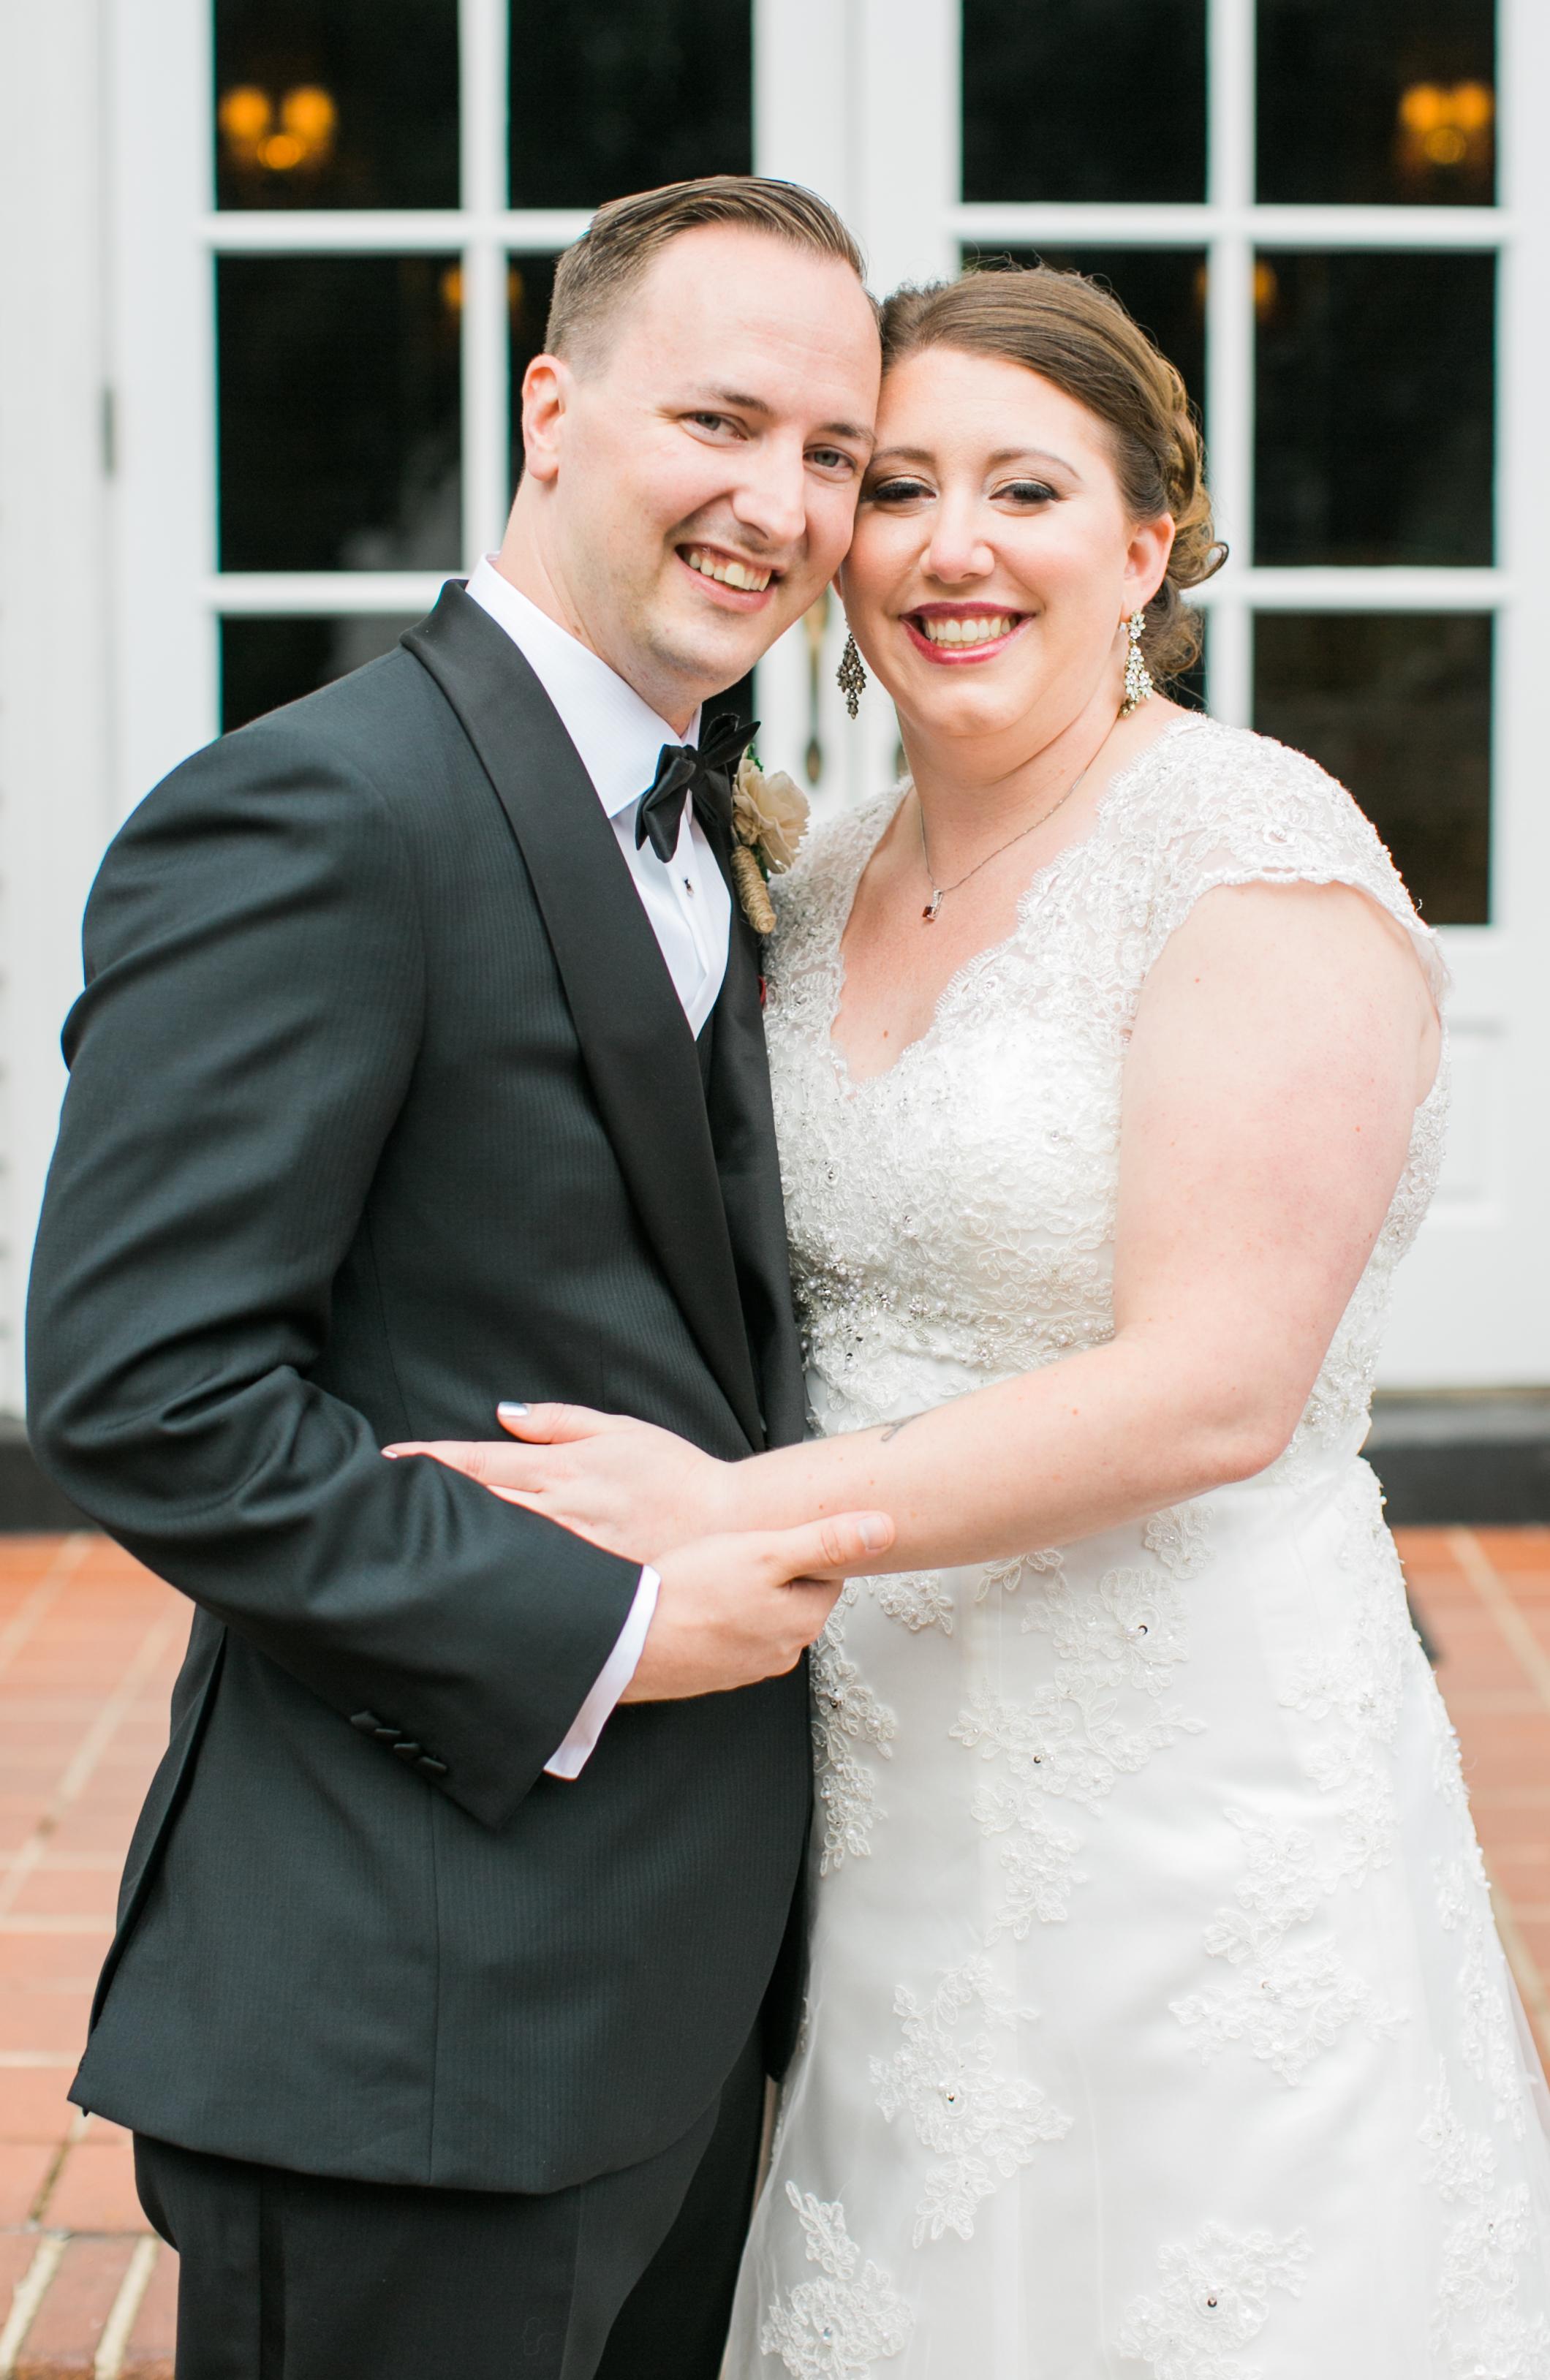 Willcox wedding in Aiken